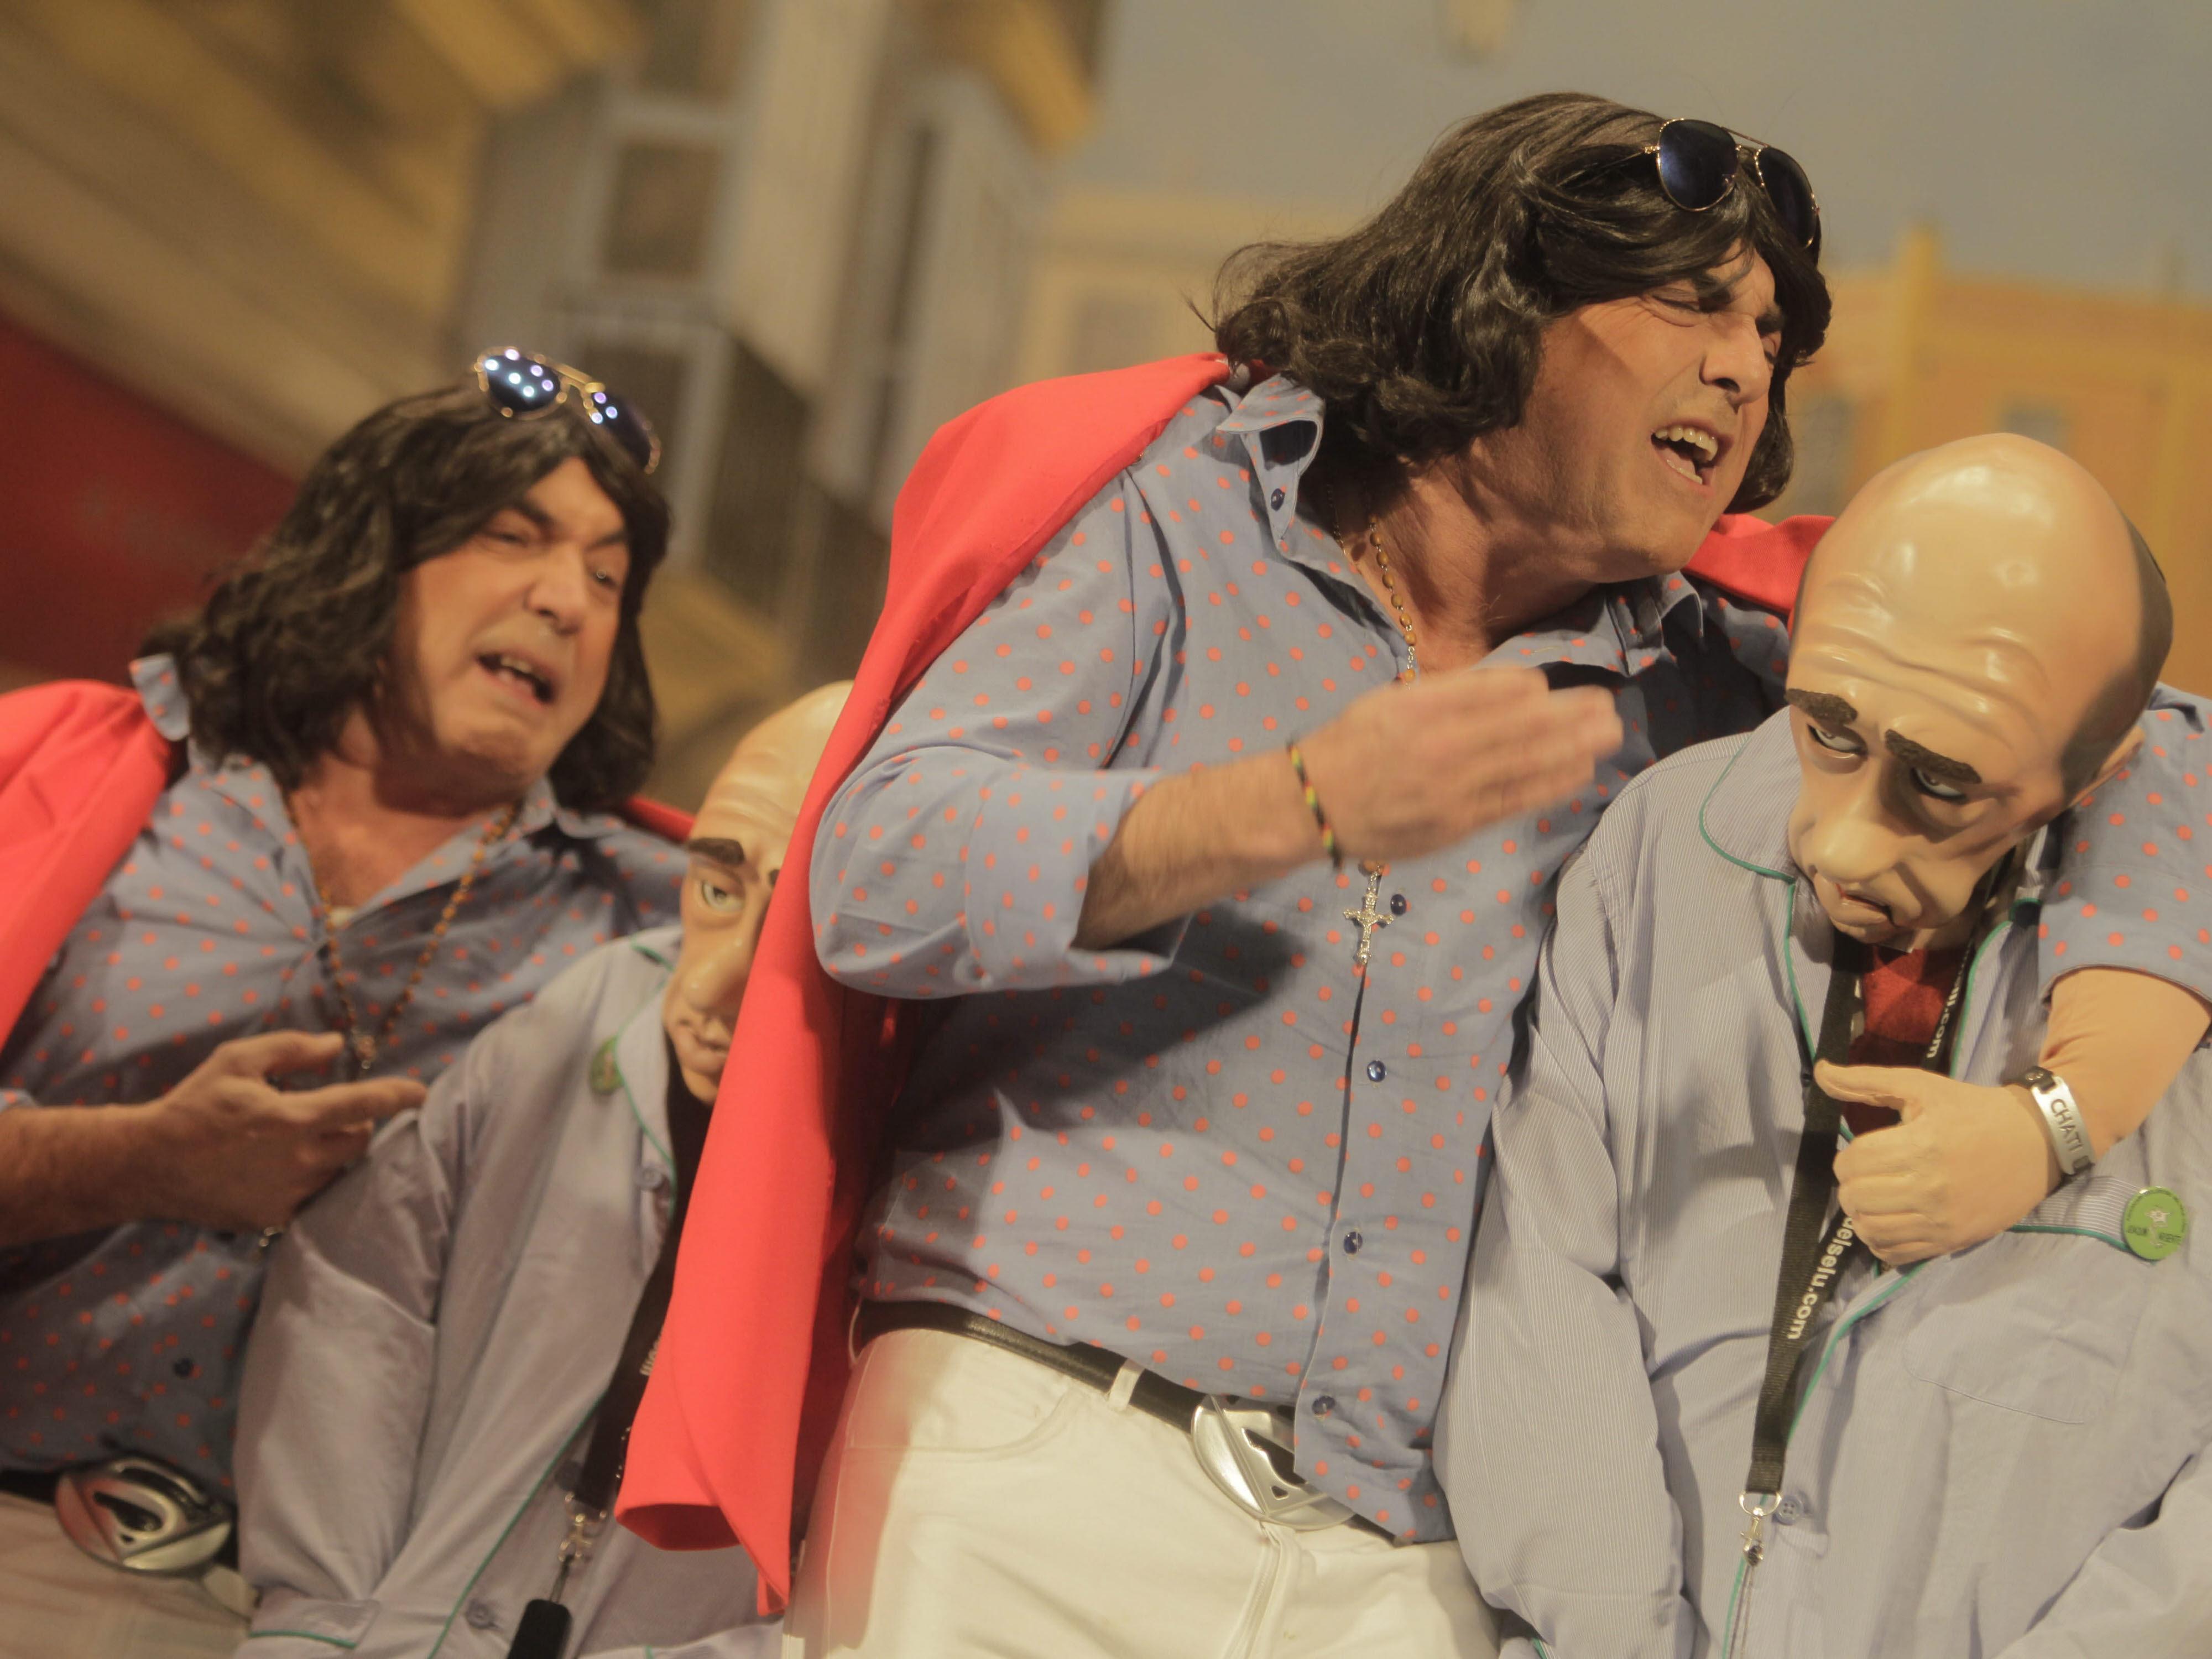 La chirigota de Selu será reclamo turístico de Cádiz en 14 ciudades españolas